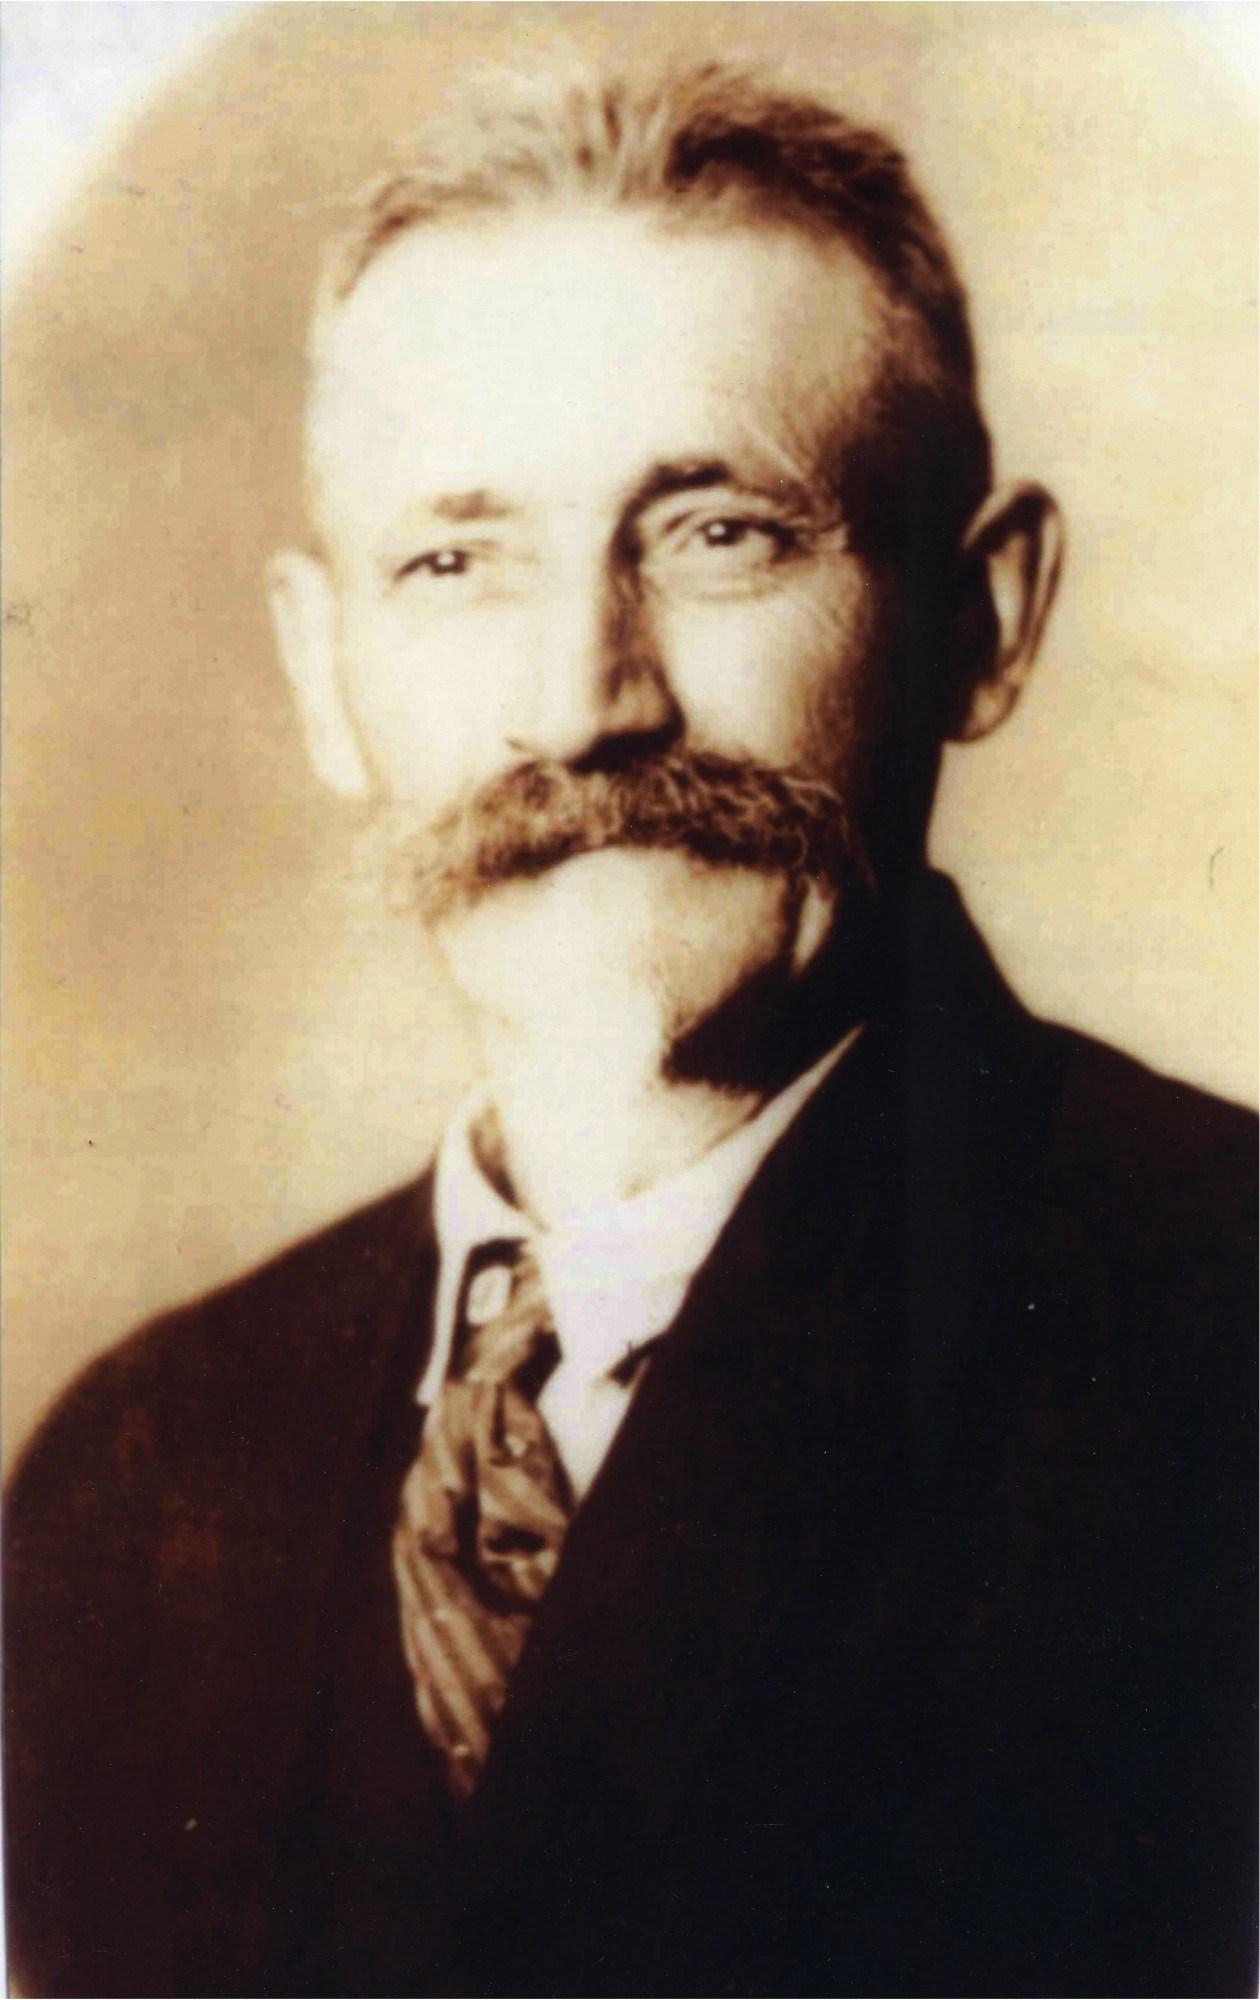 Heinrick Gustav Adolph Falk